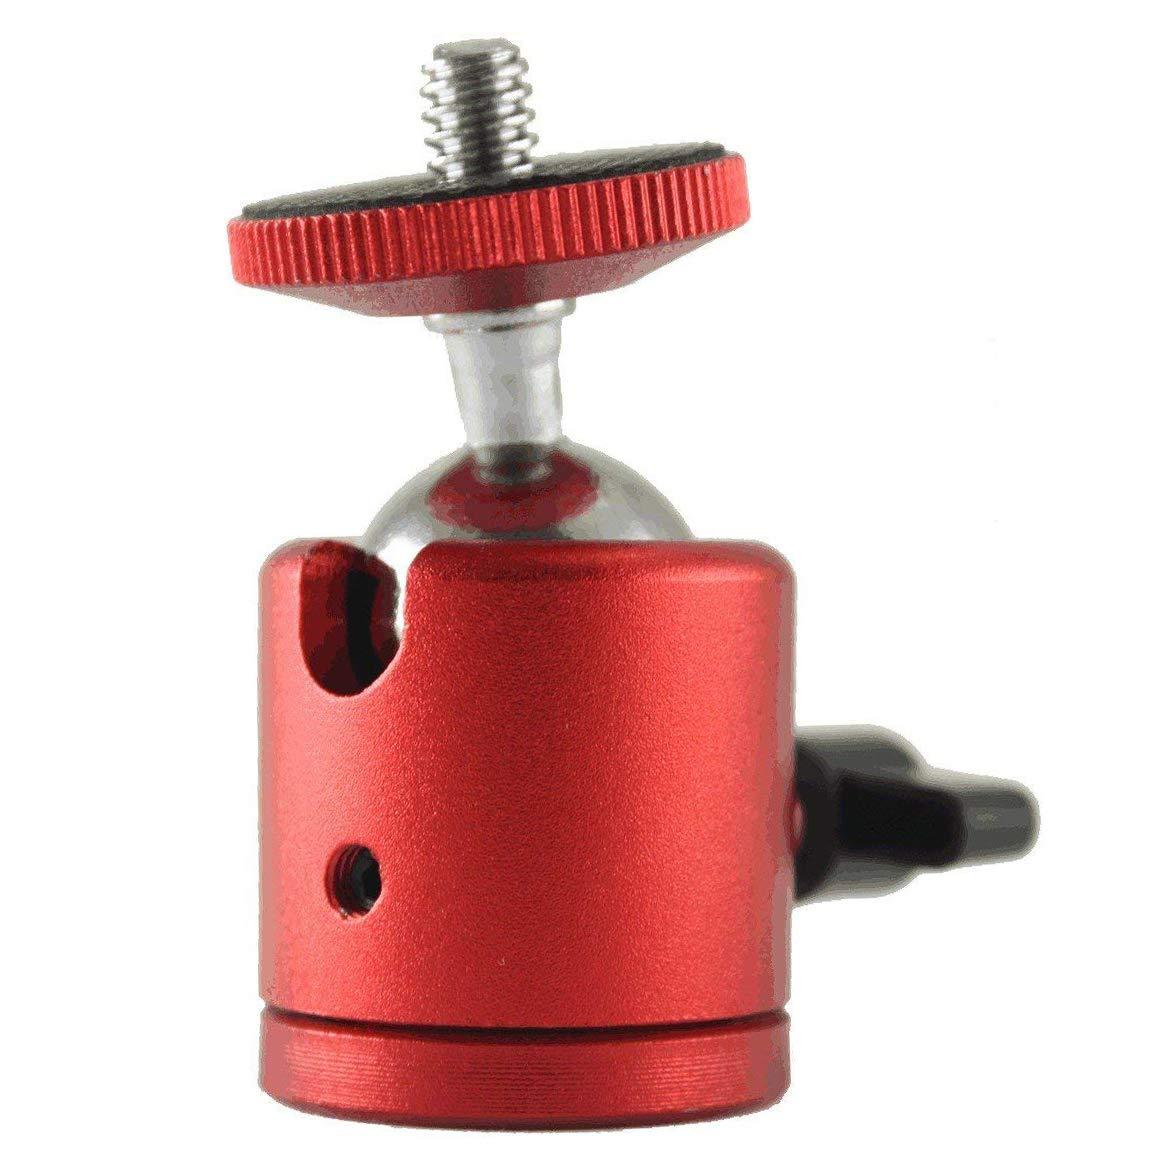 EXMAX® 1/4'' Screw 360 Degree Swivel Tripod Camera Mount Adapter Ballhead for DSLR Camera Camcorder LED Light Bracket Blue